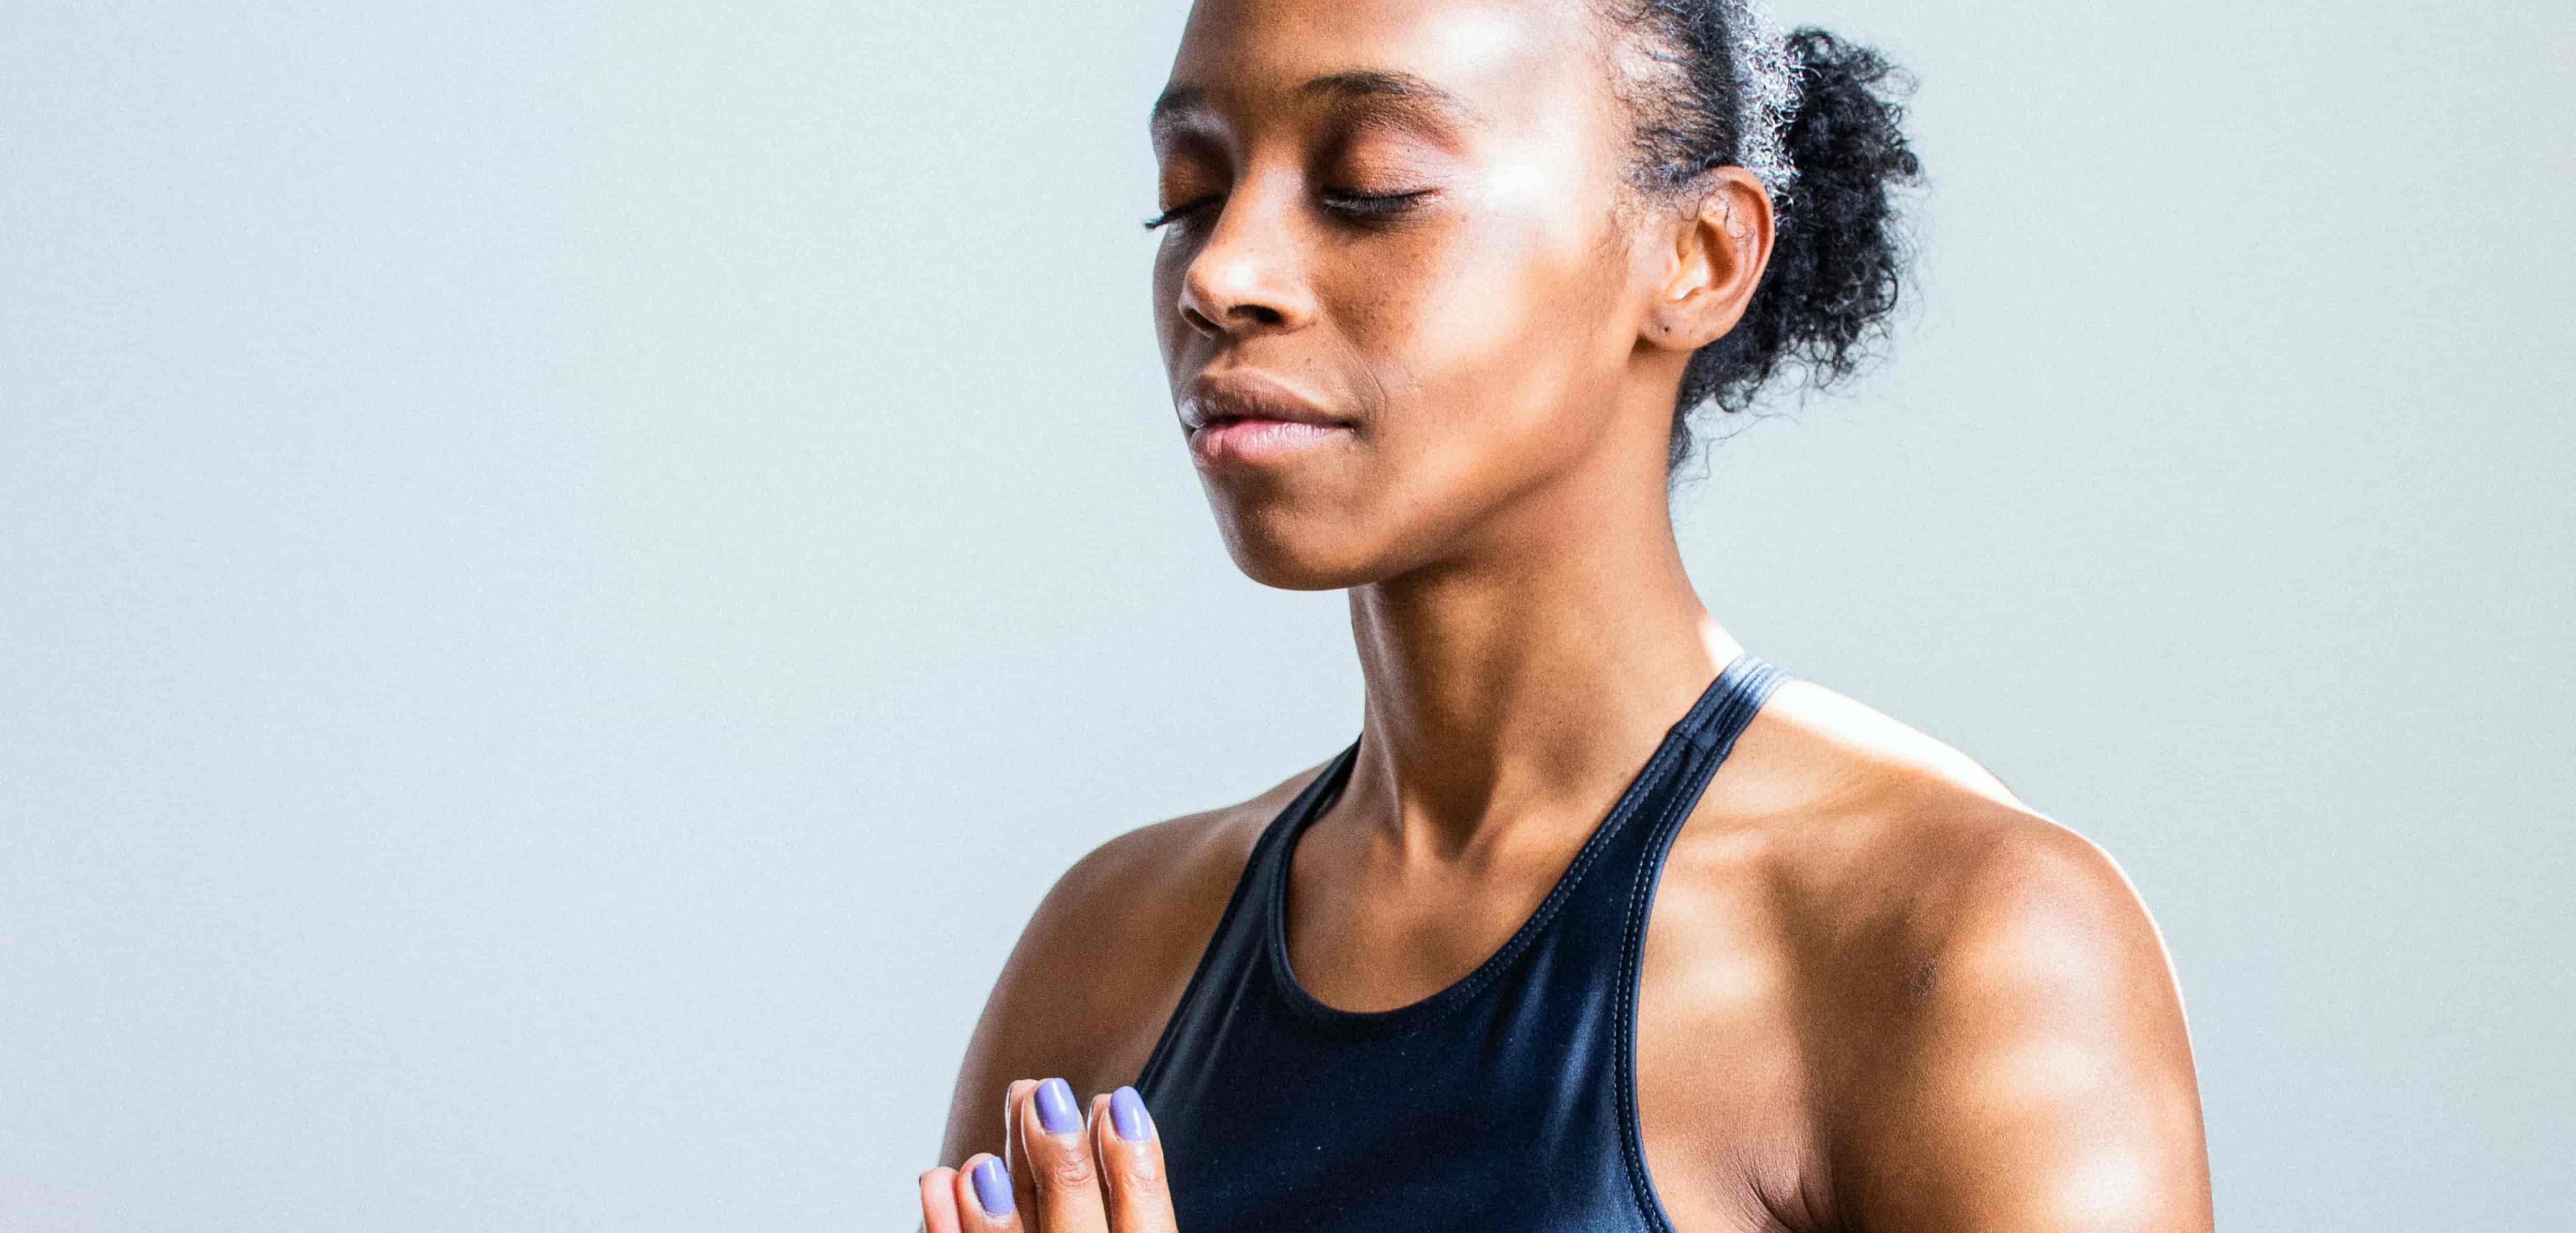 Meditating woman with a dark blue sleeveless shirt - antidepressants for menopause